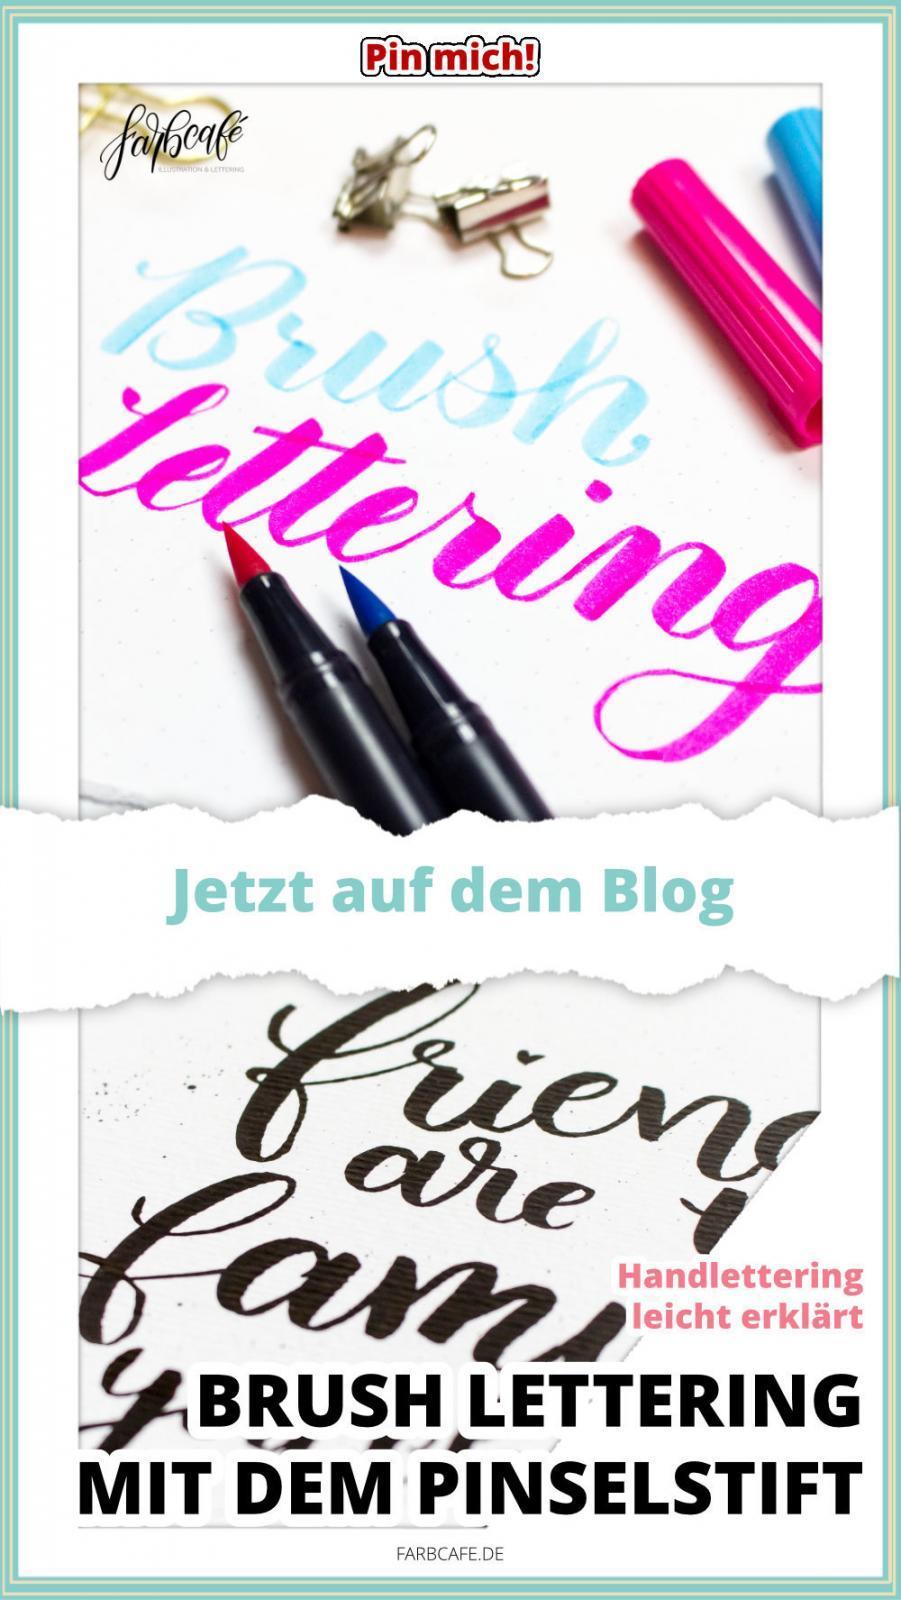 Brushlettering mit dem Pinselstift #handlettering